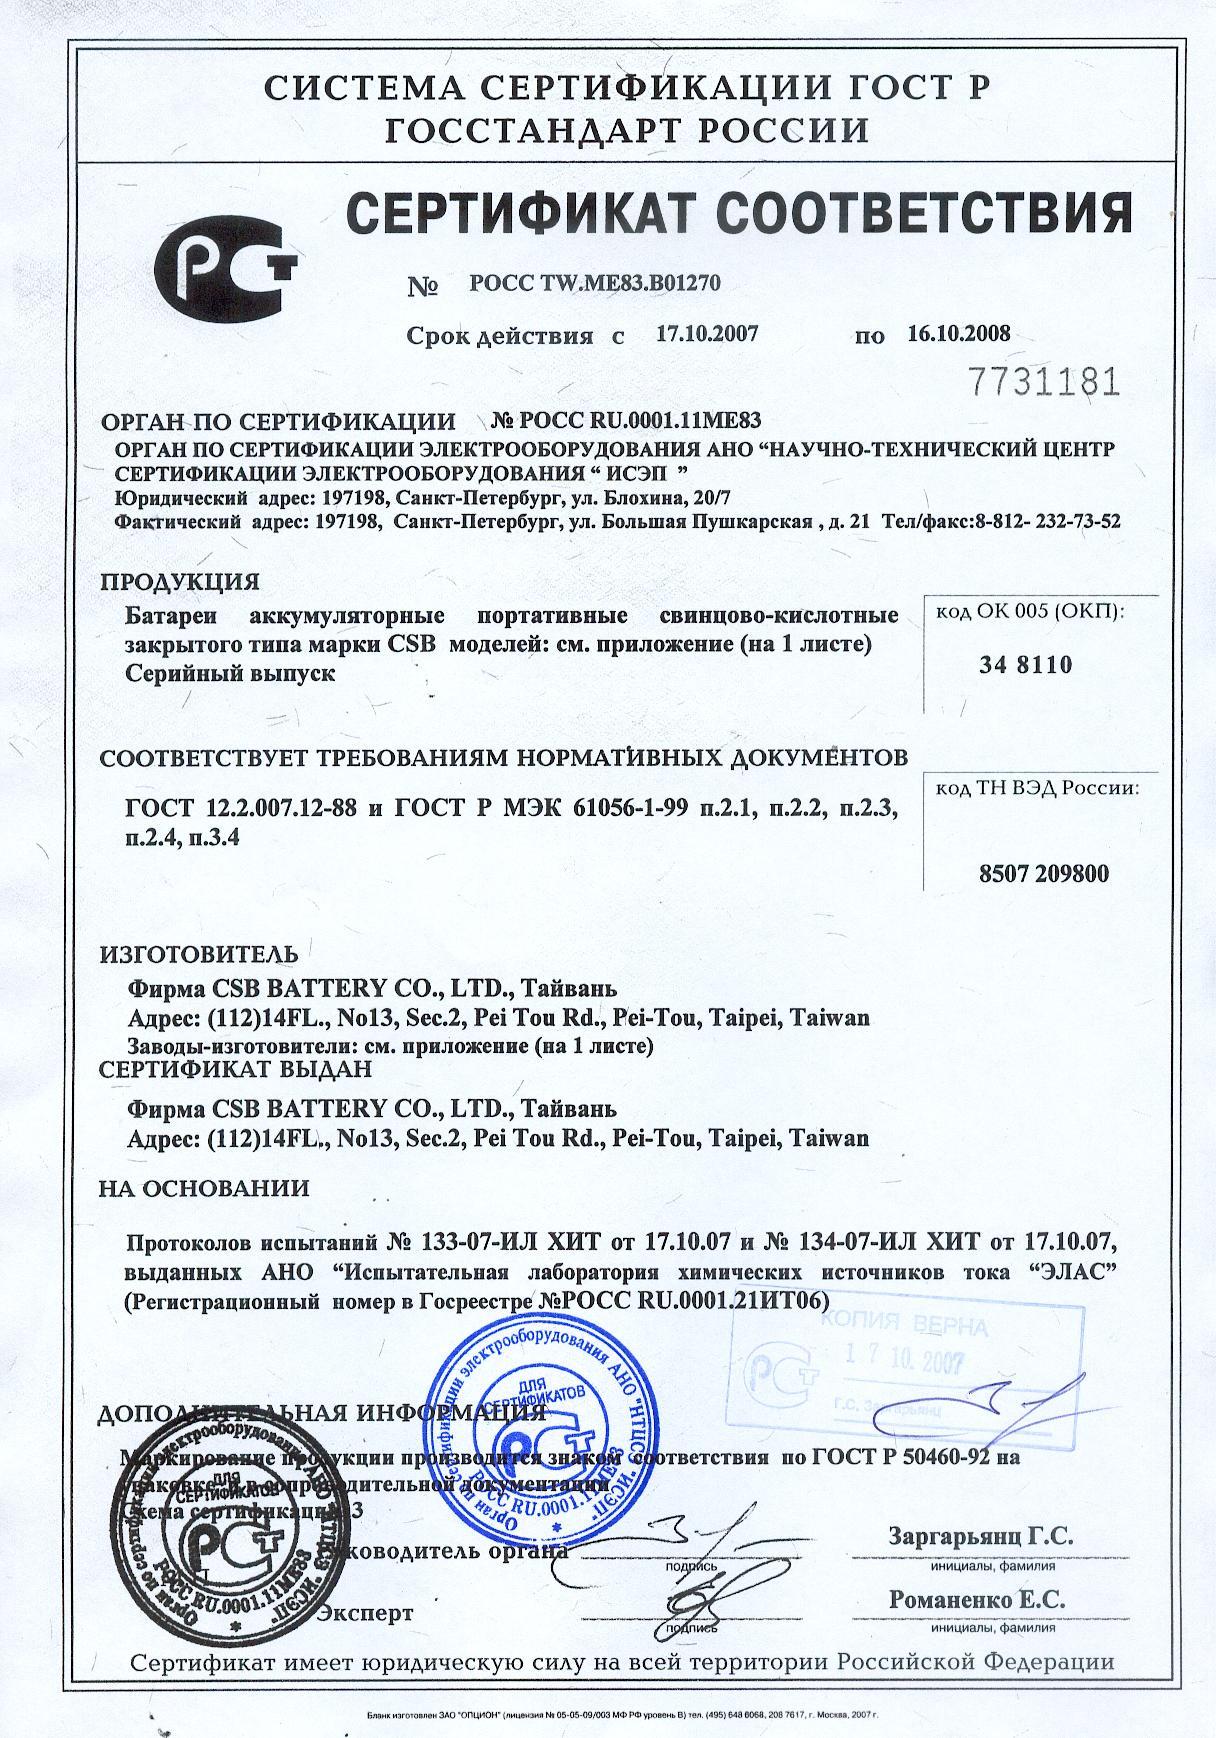 Сертификат соответствия гост р на аккуму семинар «сертификация продукции»